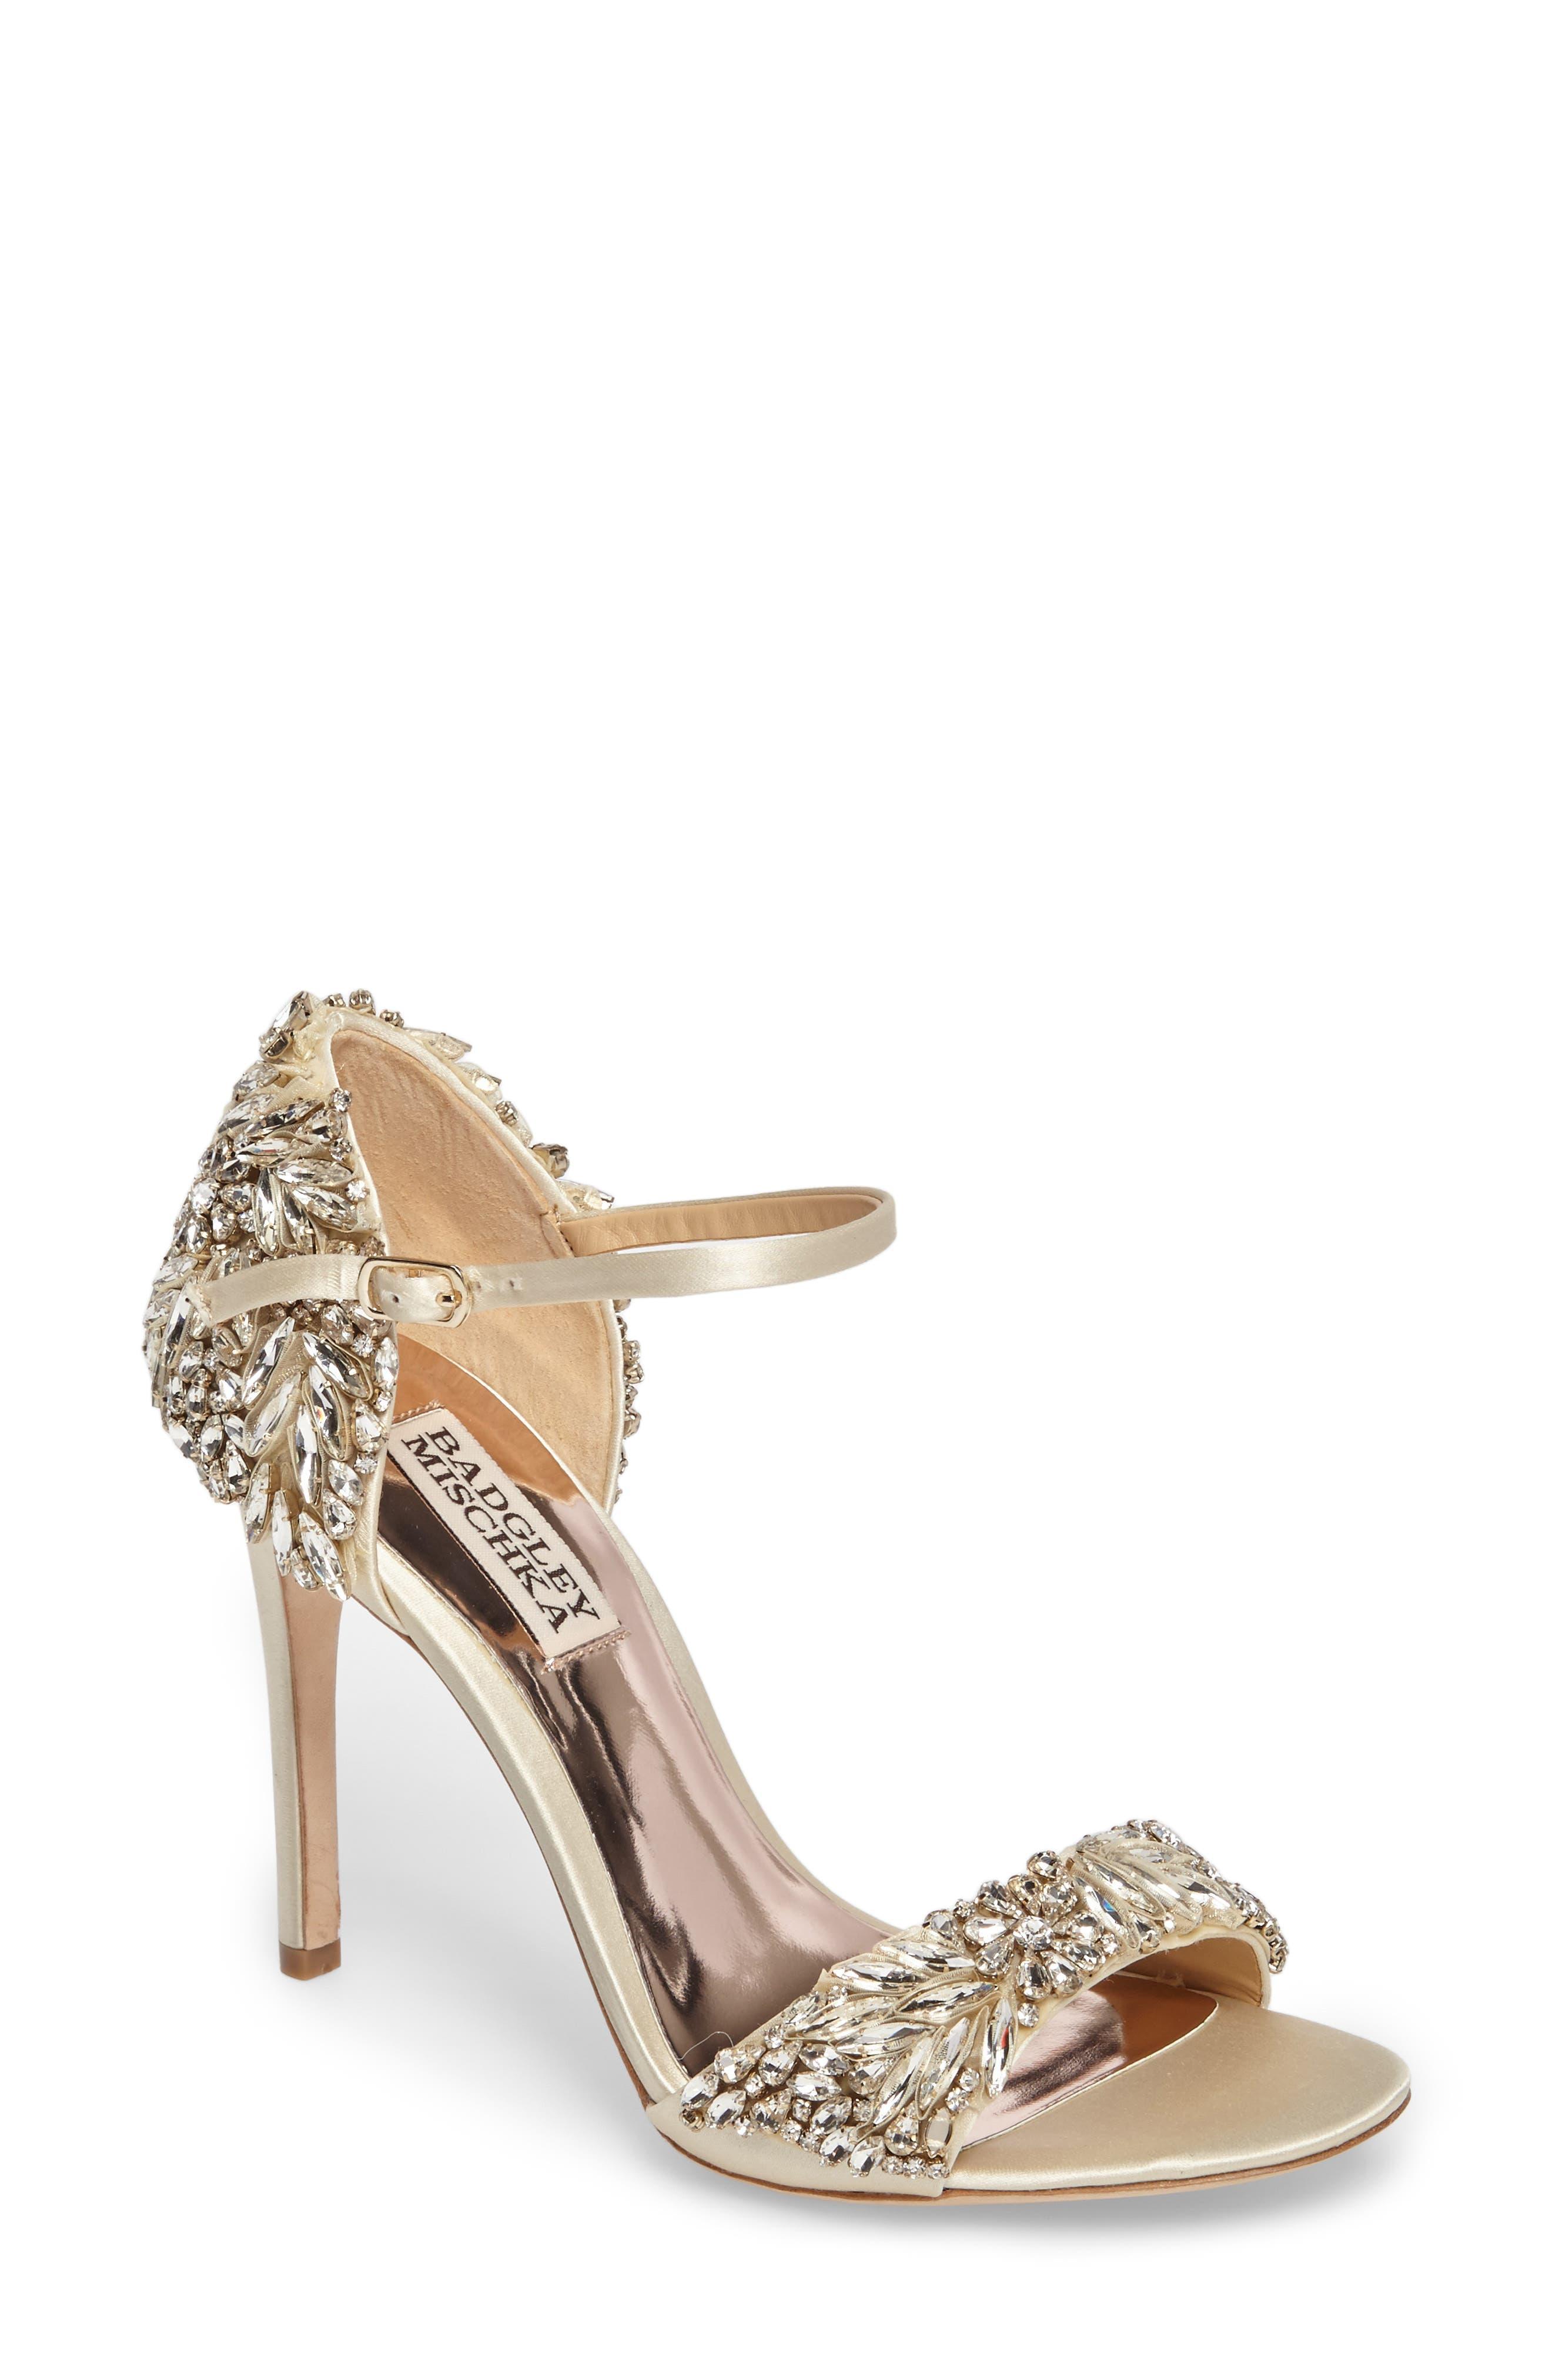 Alternate Image 1 Selected - Badgley Mischka Tampa Ankle Strap Sandal (Women)